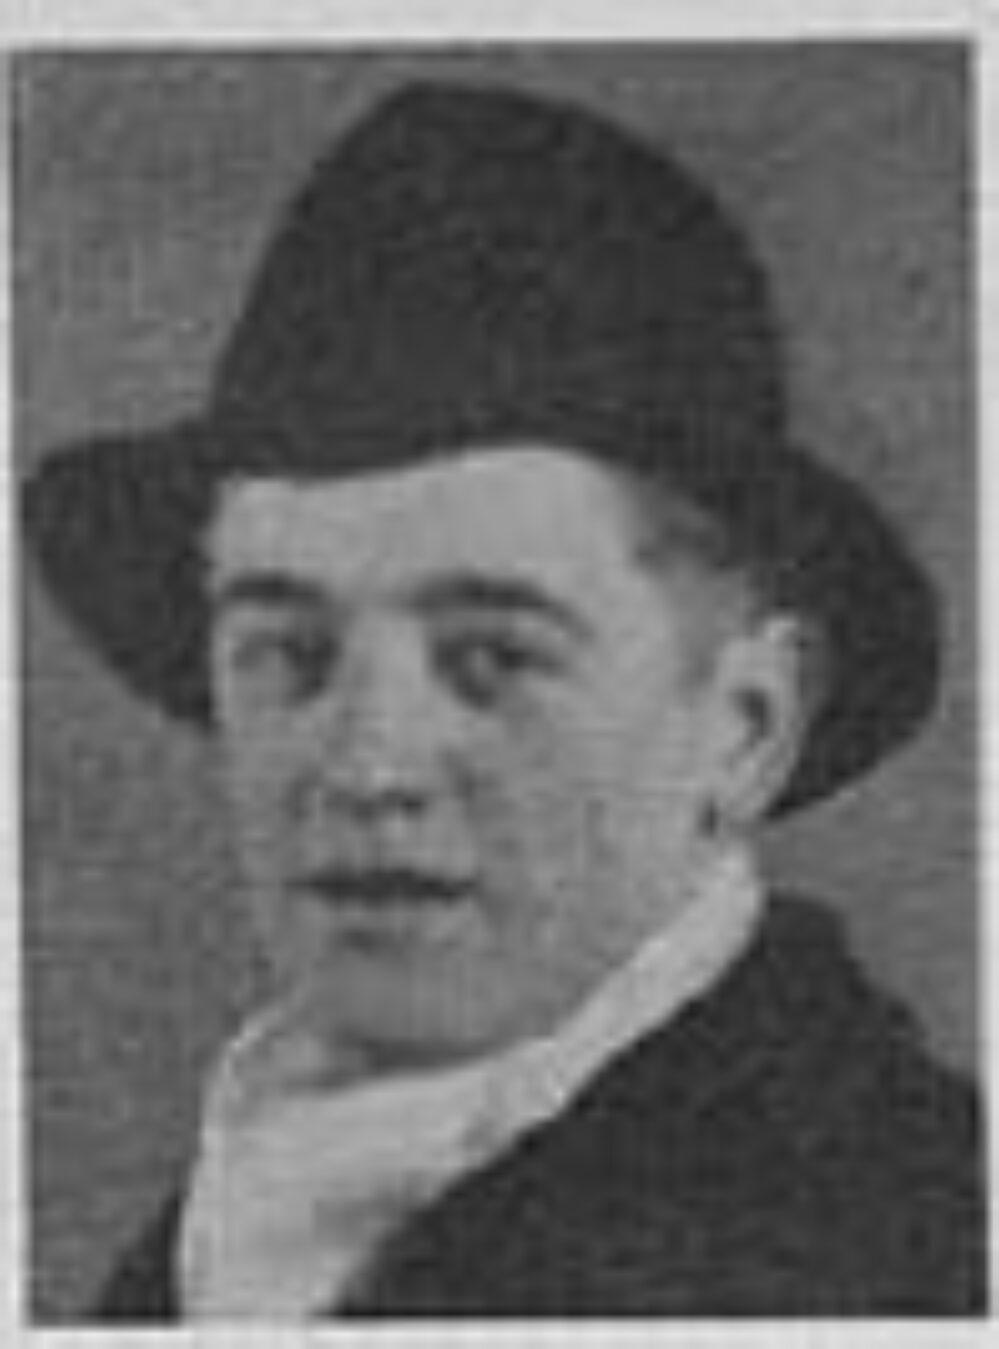 Harry Stenehjem